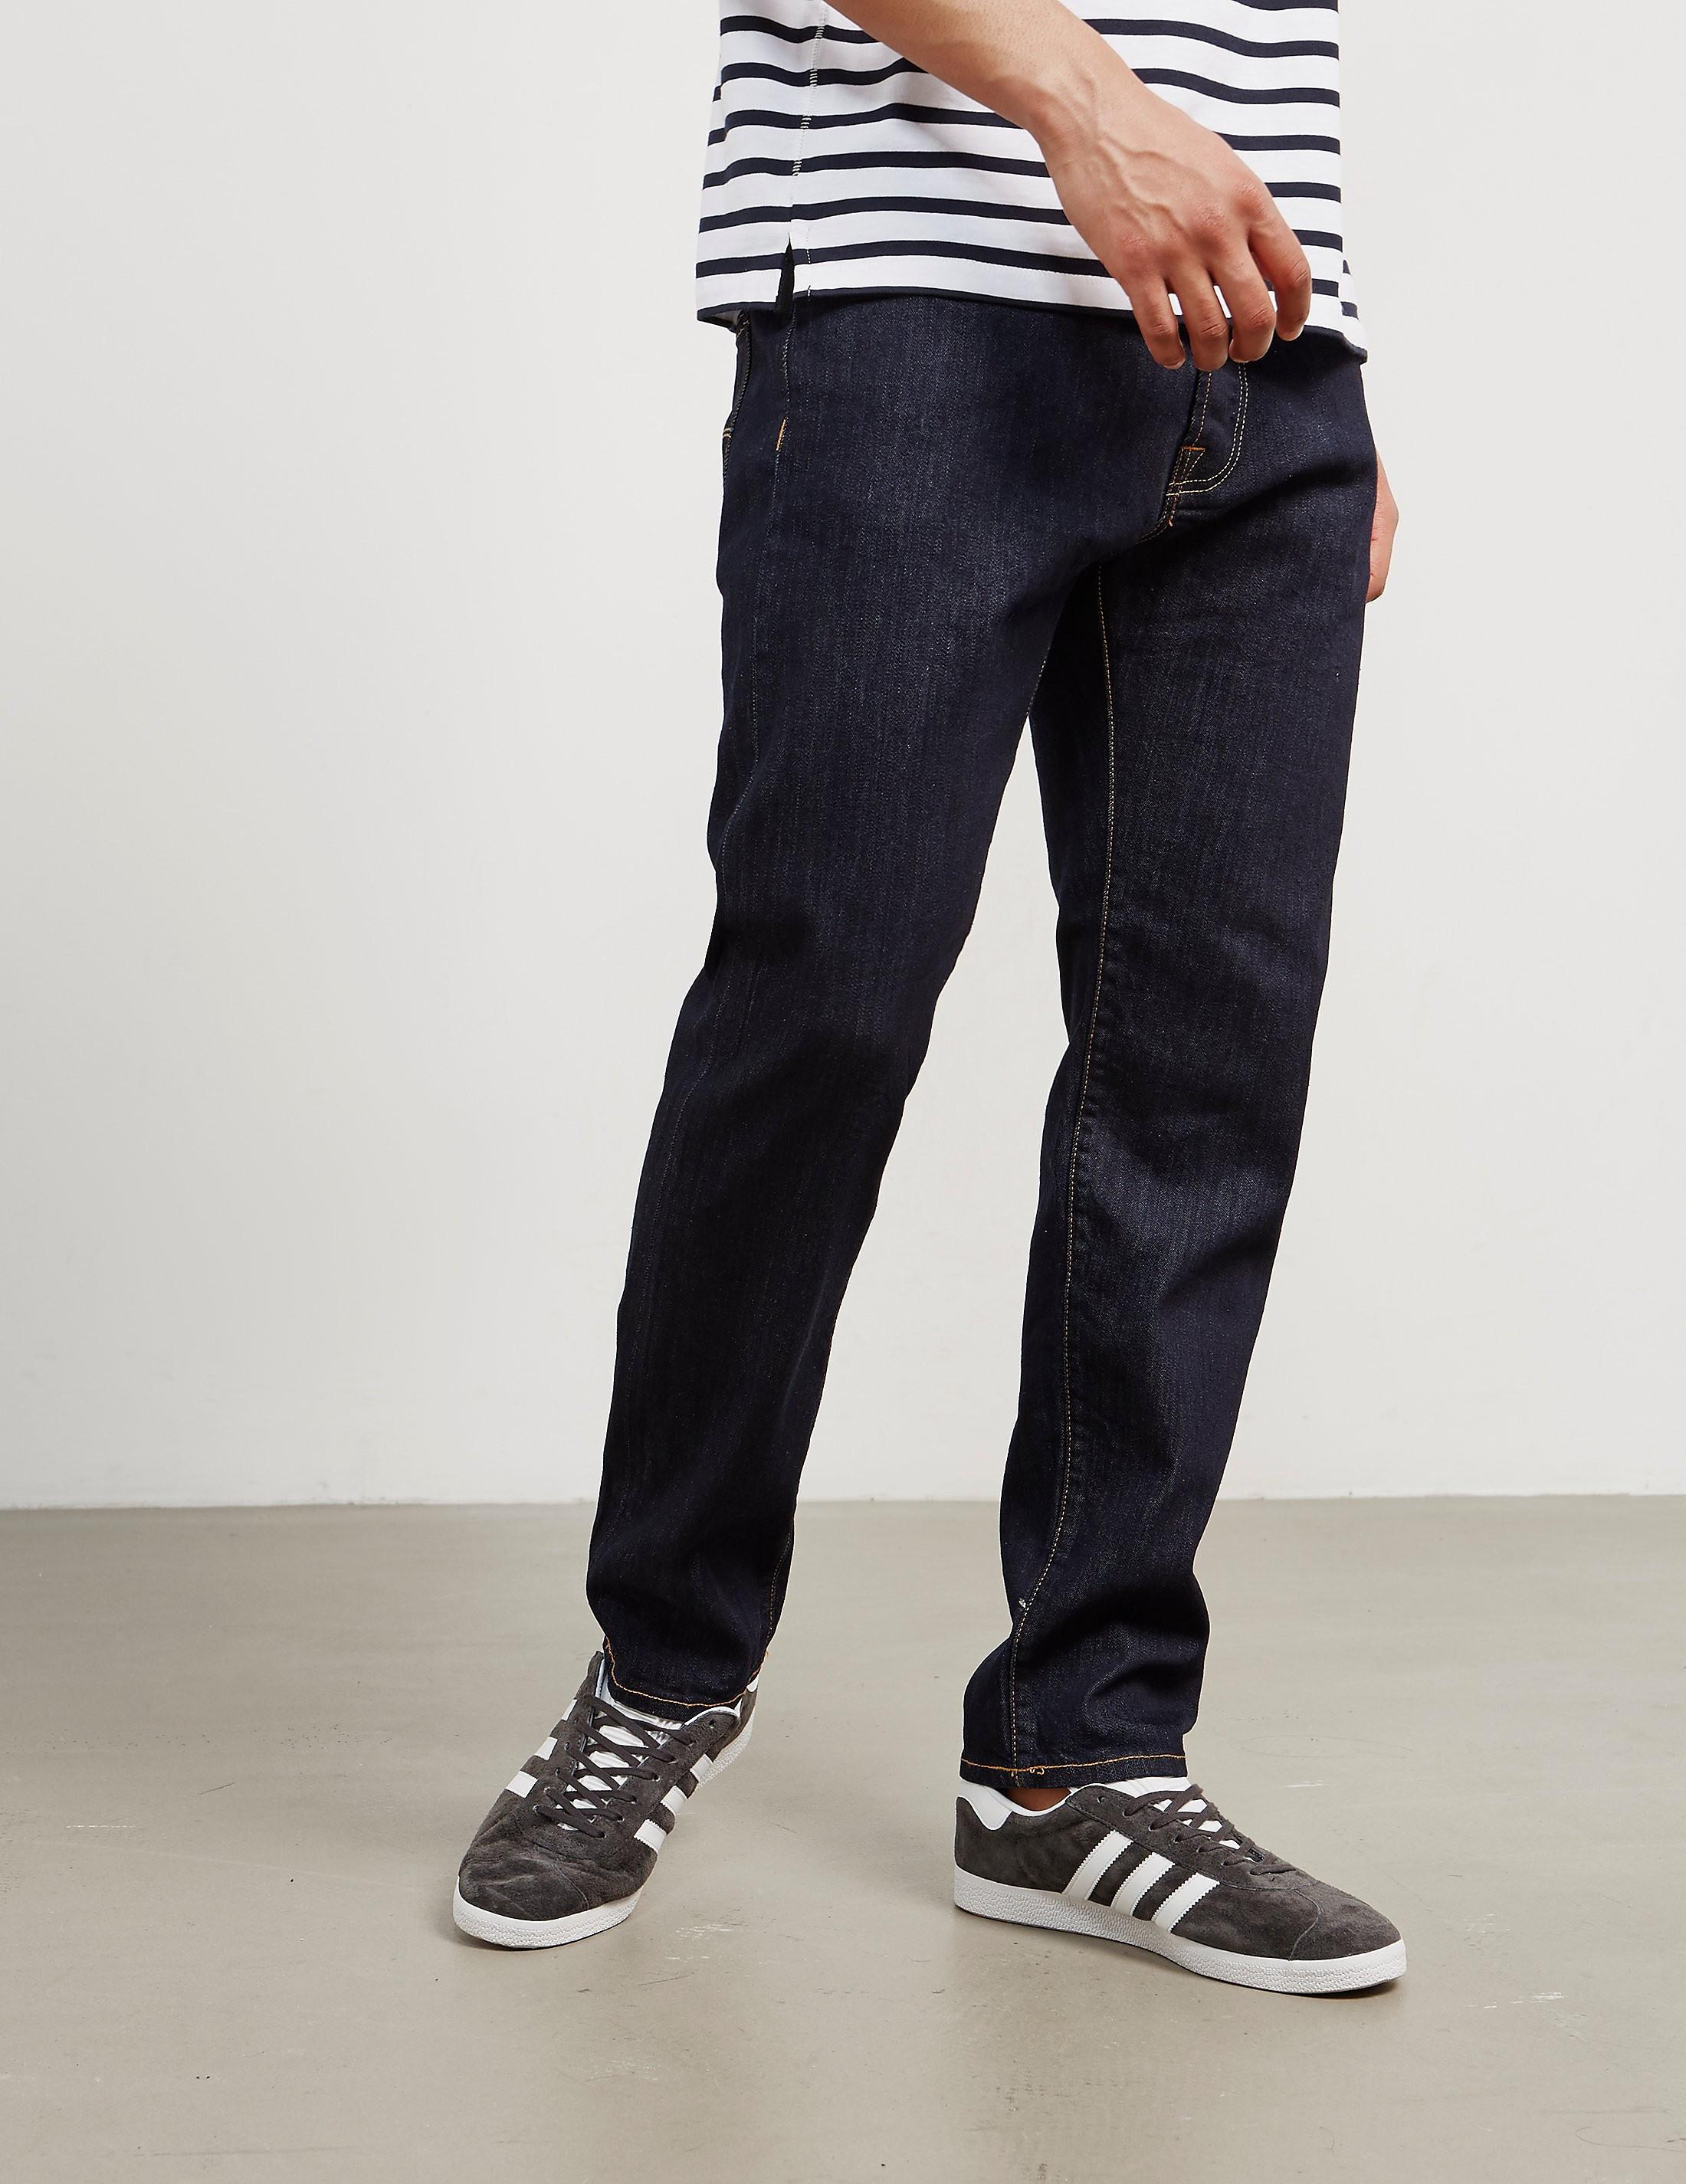 Edwin ED-55 List Regular Tapered Jeans